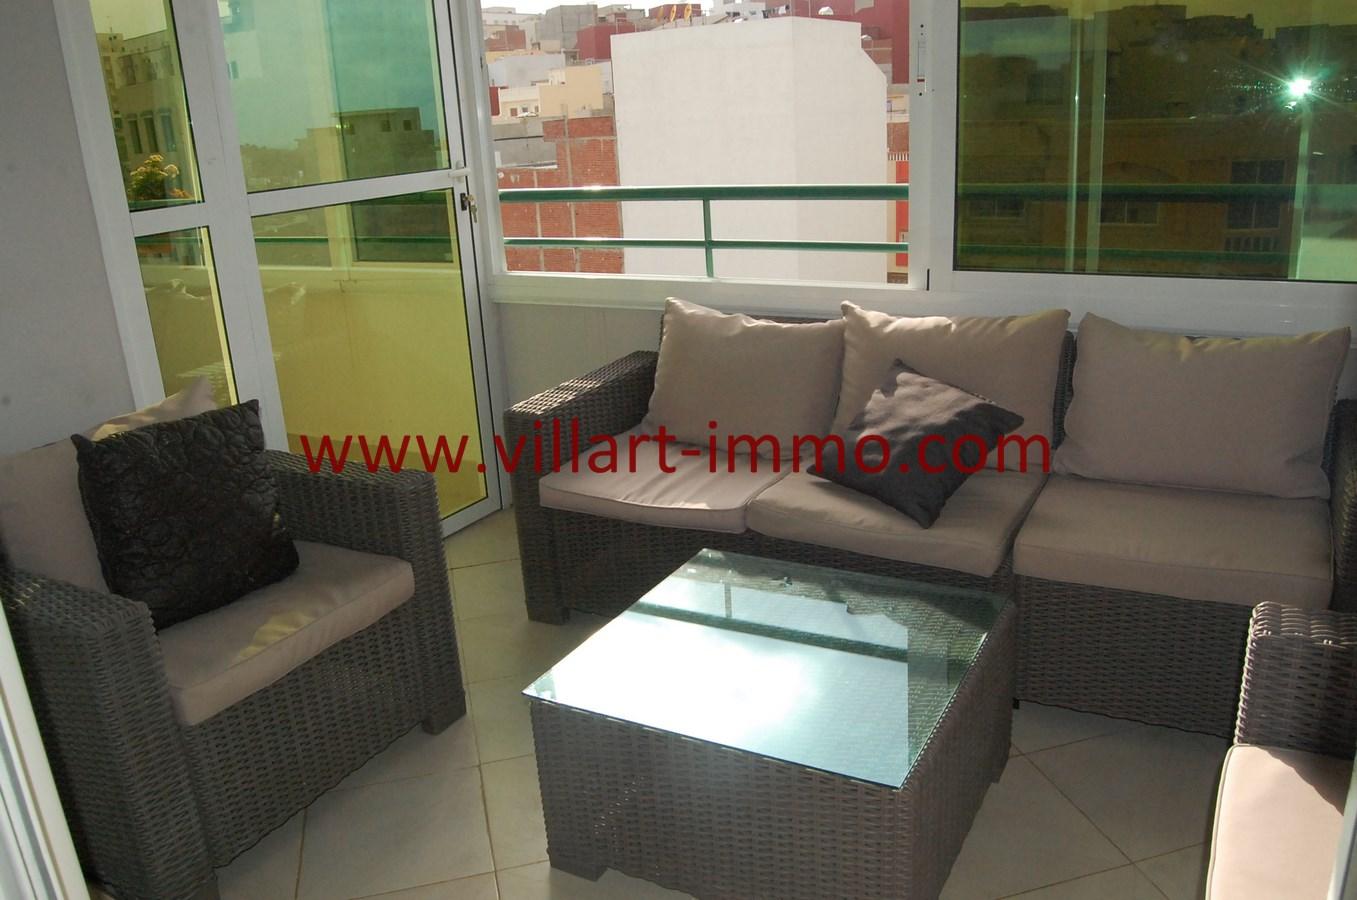 6-Vente-Appartement-Tanger-Terrasse 1-VA480-Villart Immo